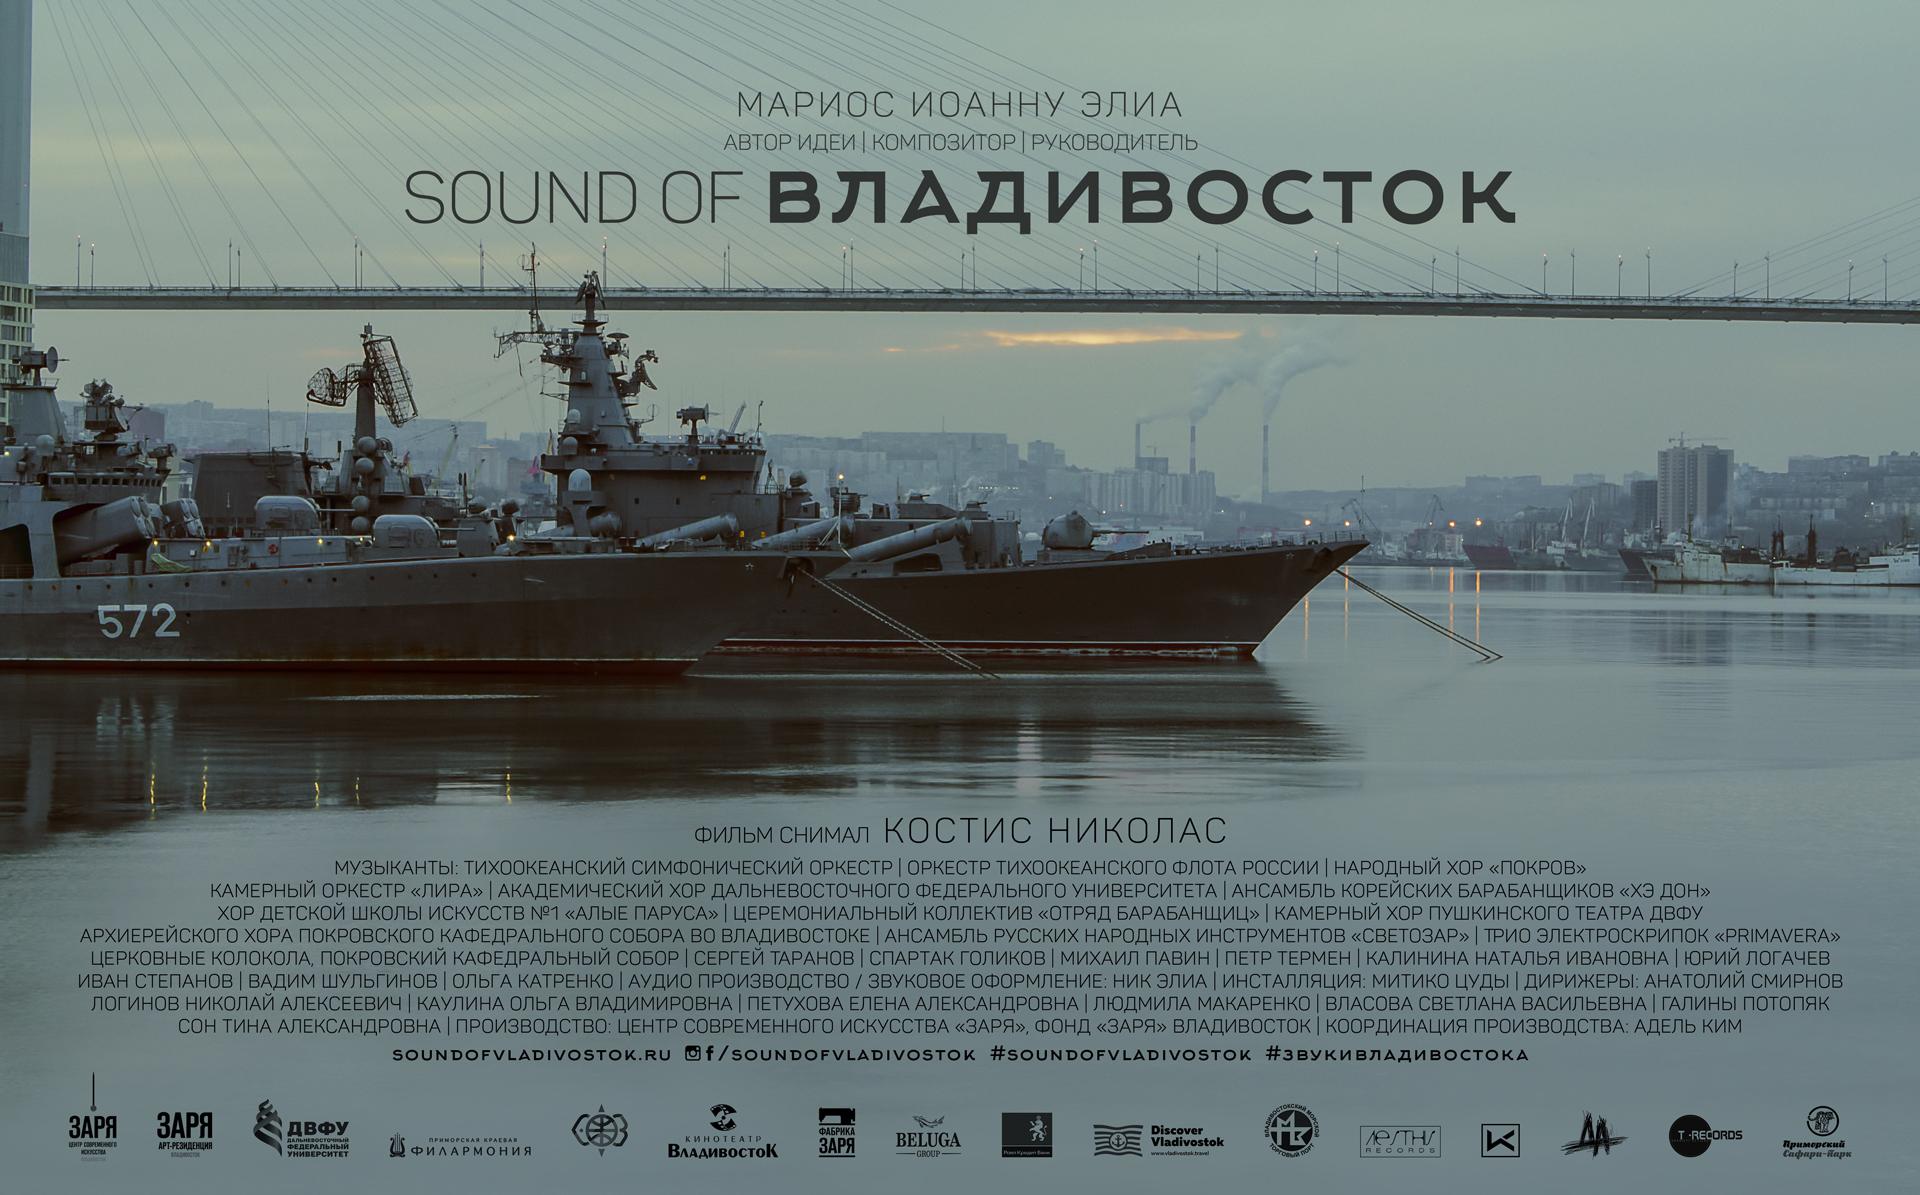 Sound of Vladivostok by Marios Joannou Elia